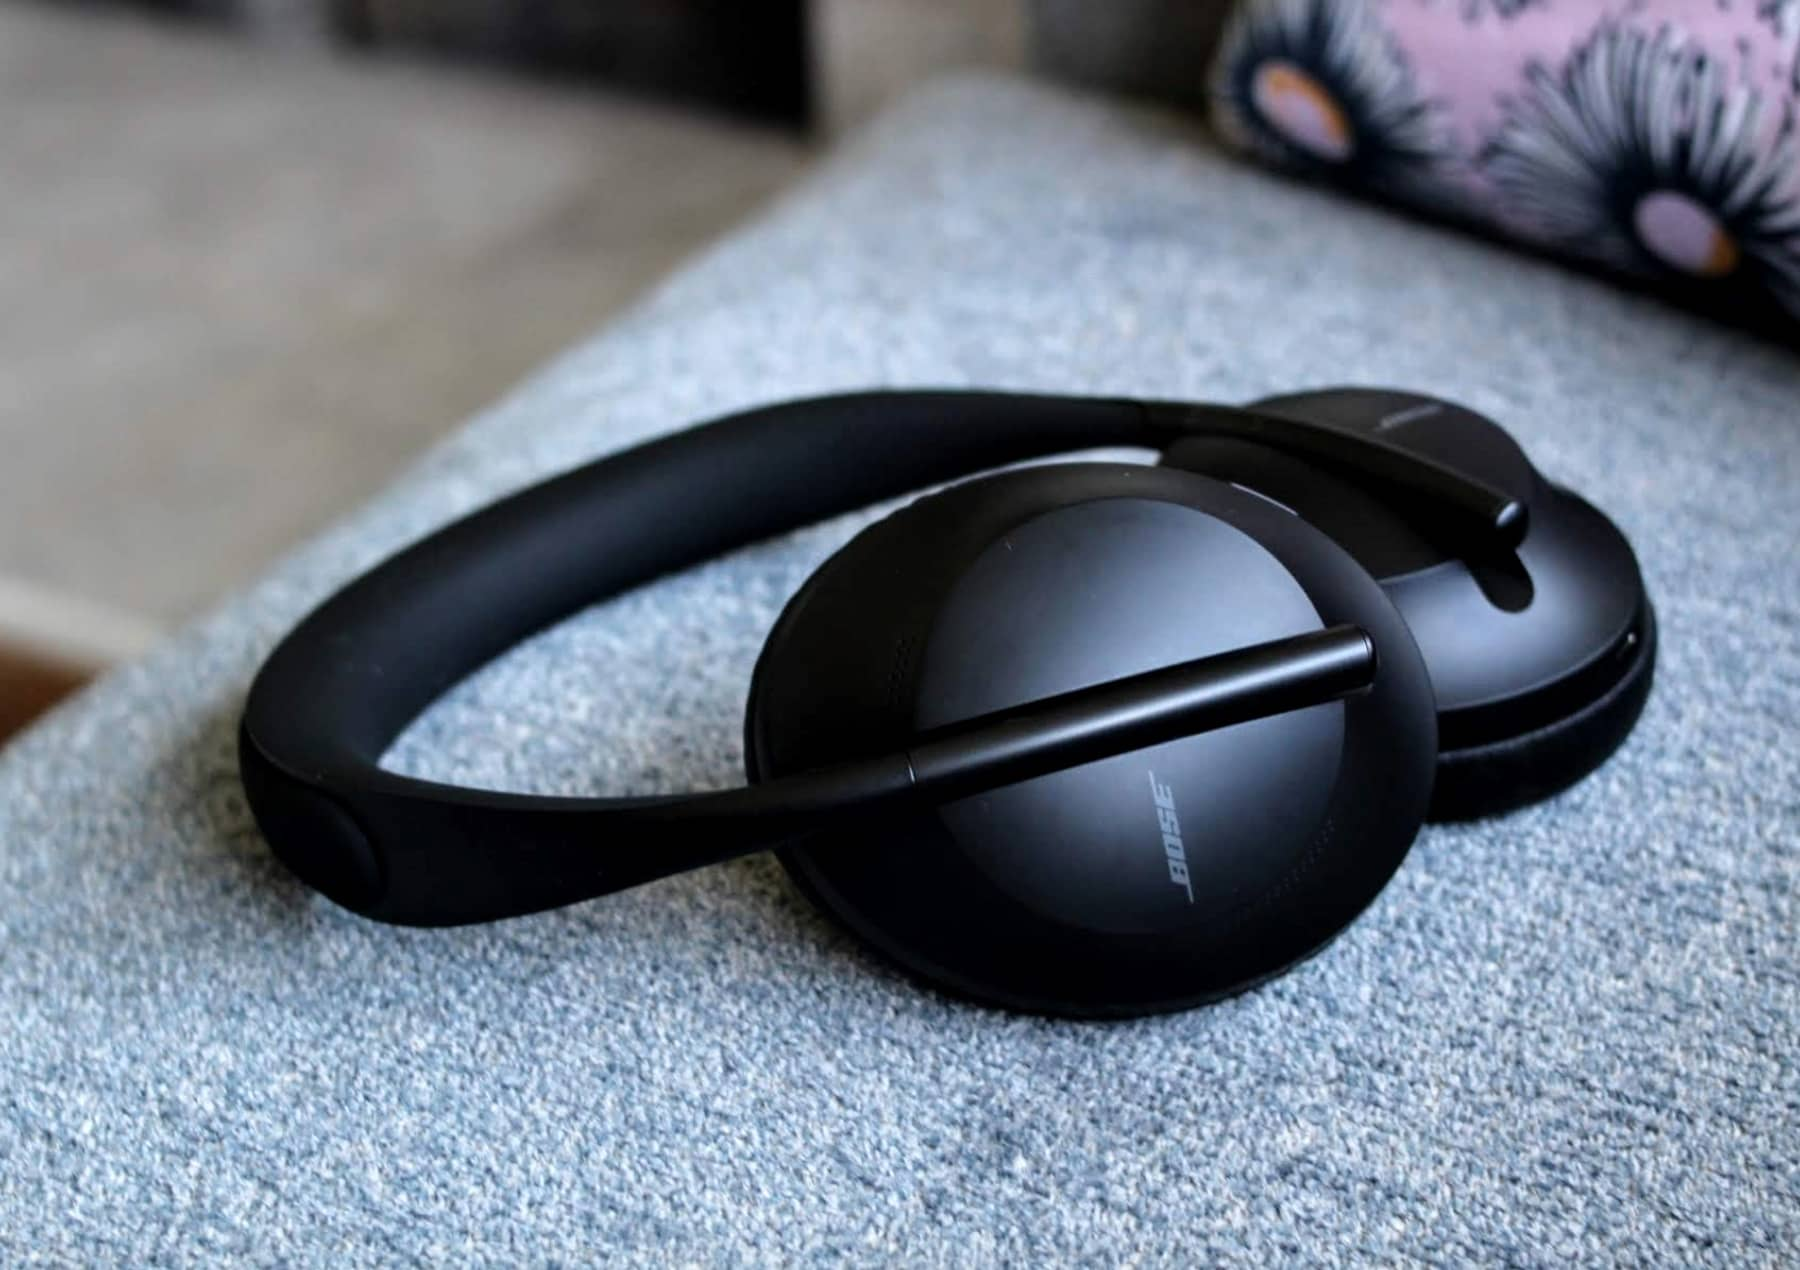 Best Audio Phones 2020 Bose NC700 headphones review